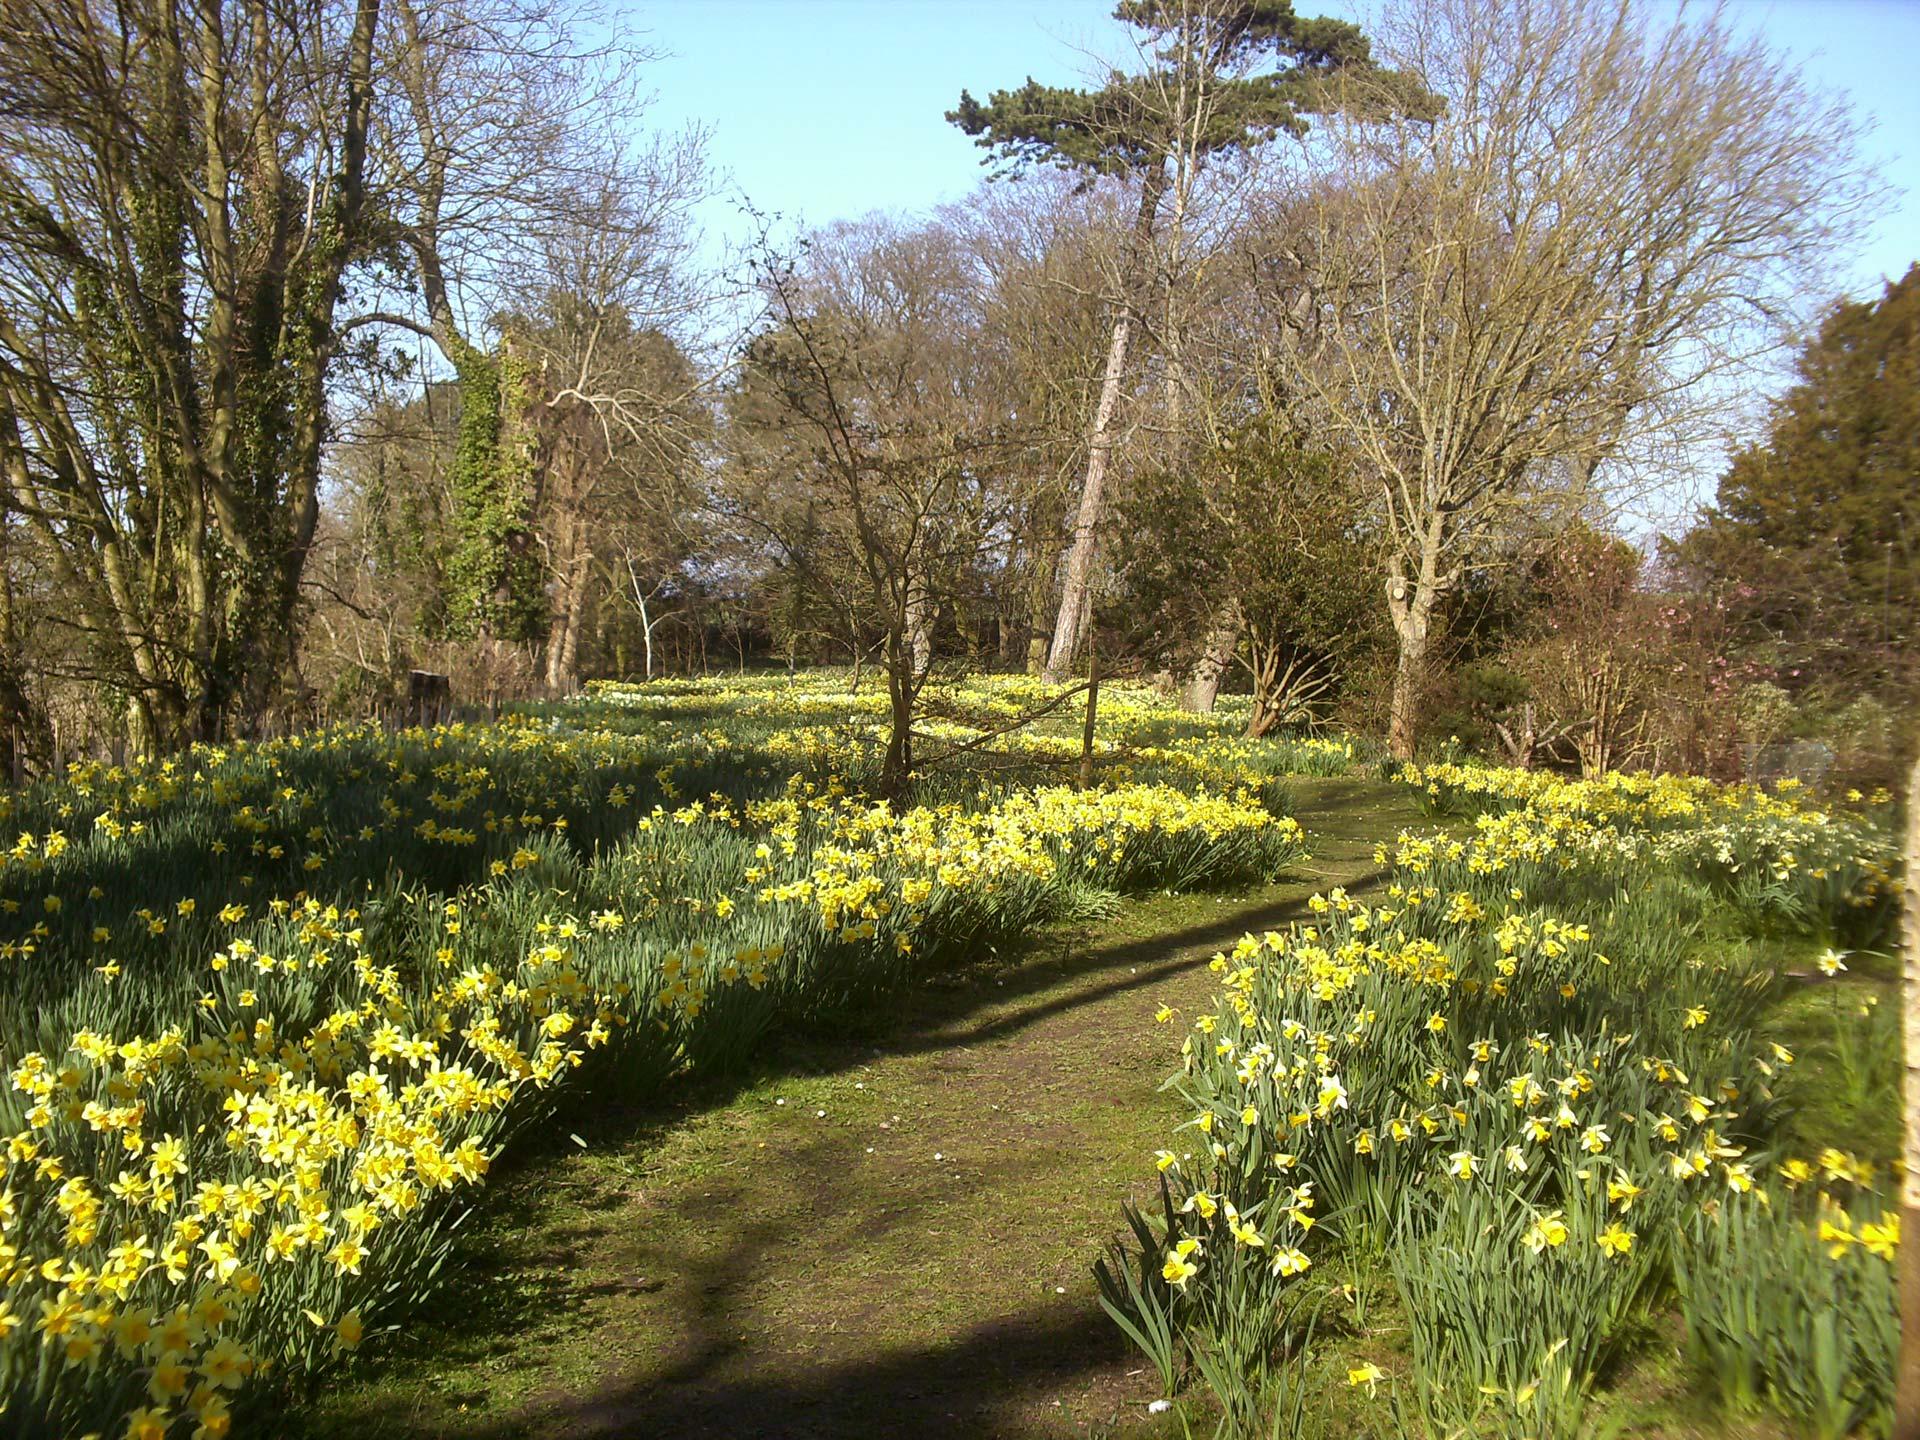 Daffodil Area at Hindringham Hall, Norfolk